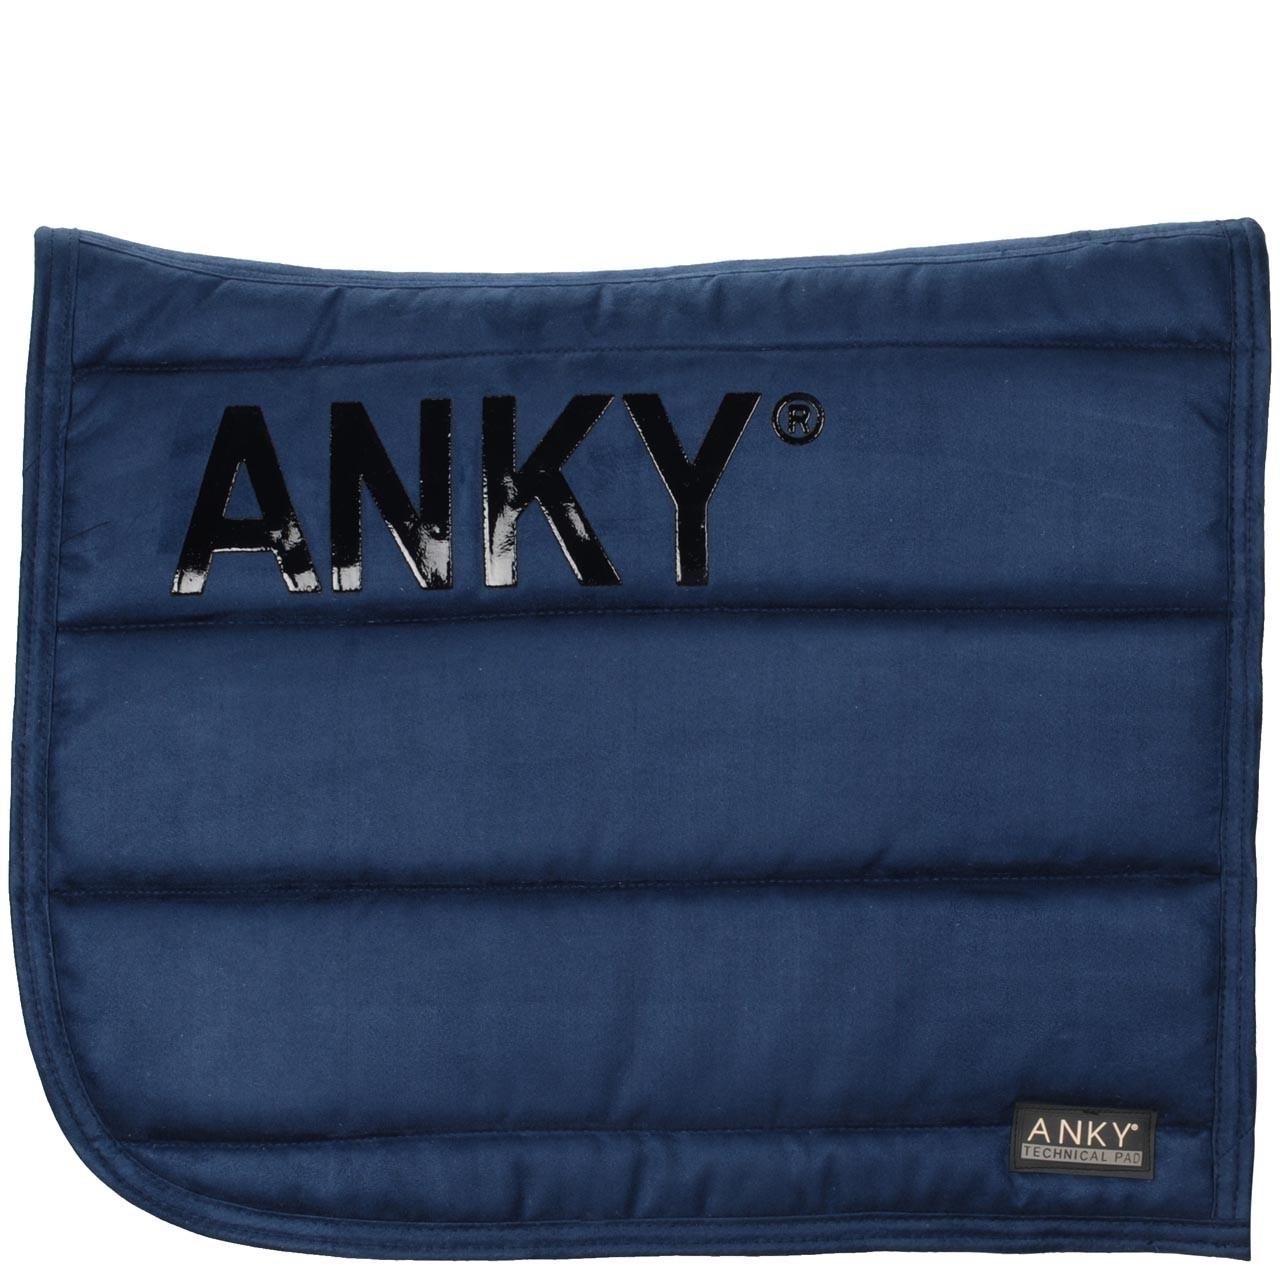 Anky Basis pad donkerblauw maat:full